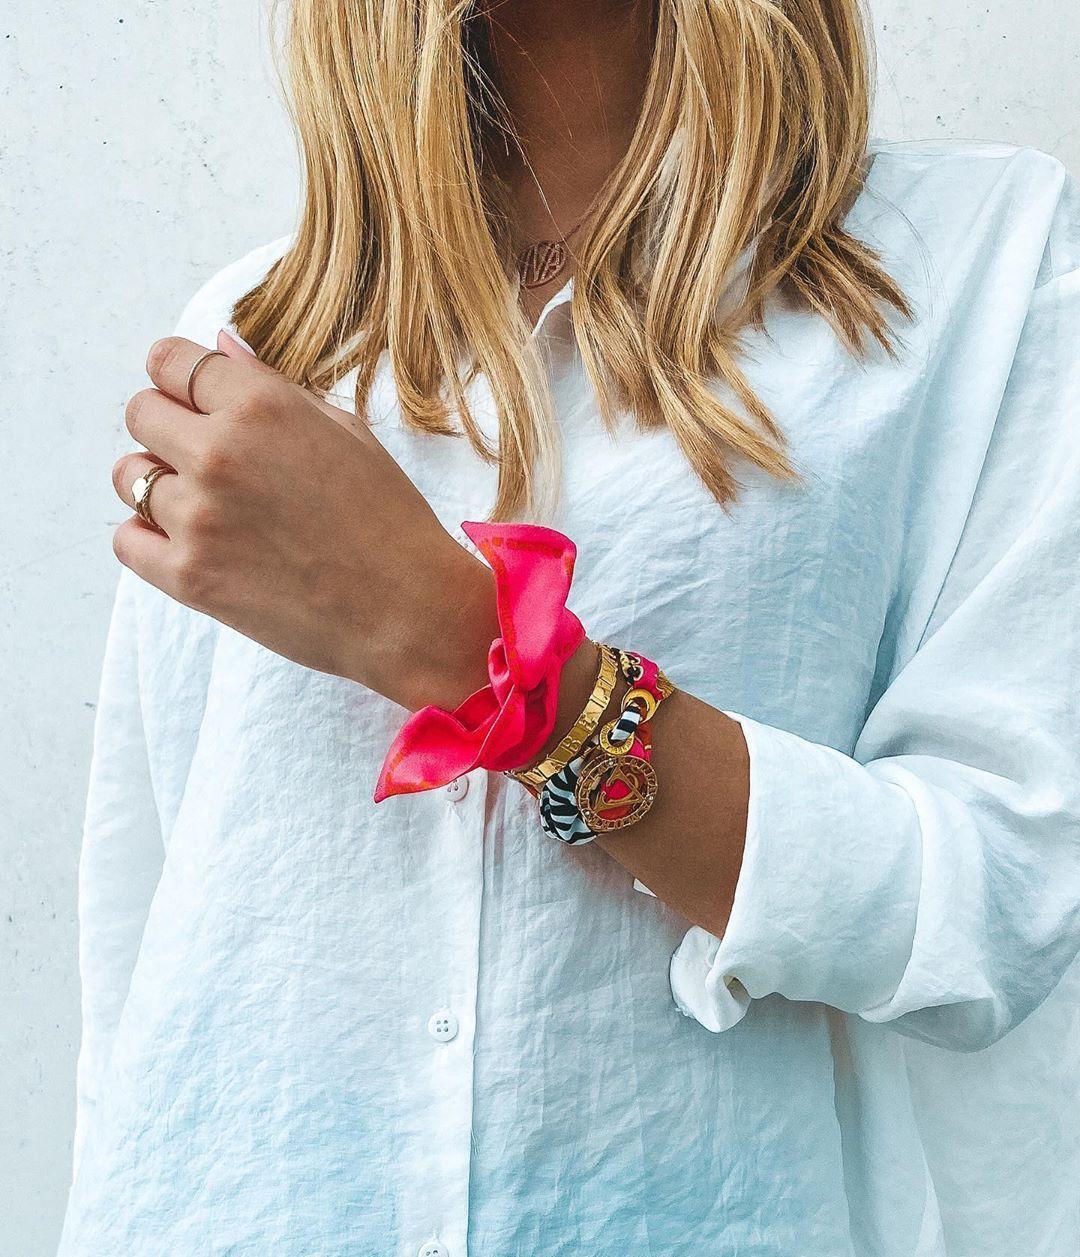 "VIVABELLAMORE on Instagram: ""💞EYE CATCHER 💞 #spring #colorful #bracelets #jewelry #schmuck #schmuckliebe #loveyourself #selbstliebe #achtsamkeit #passion #postoftheday…"""